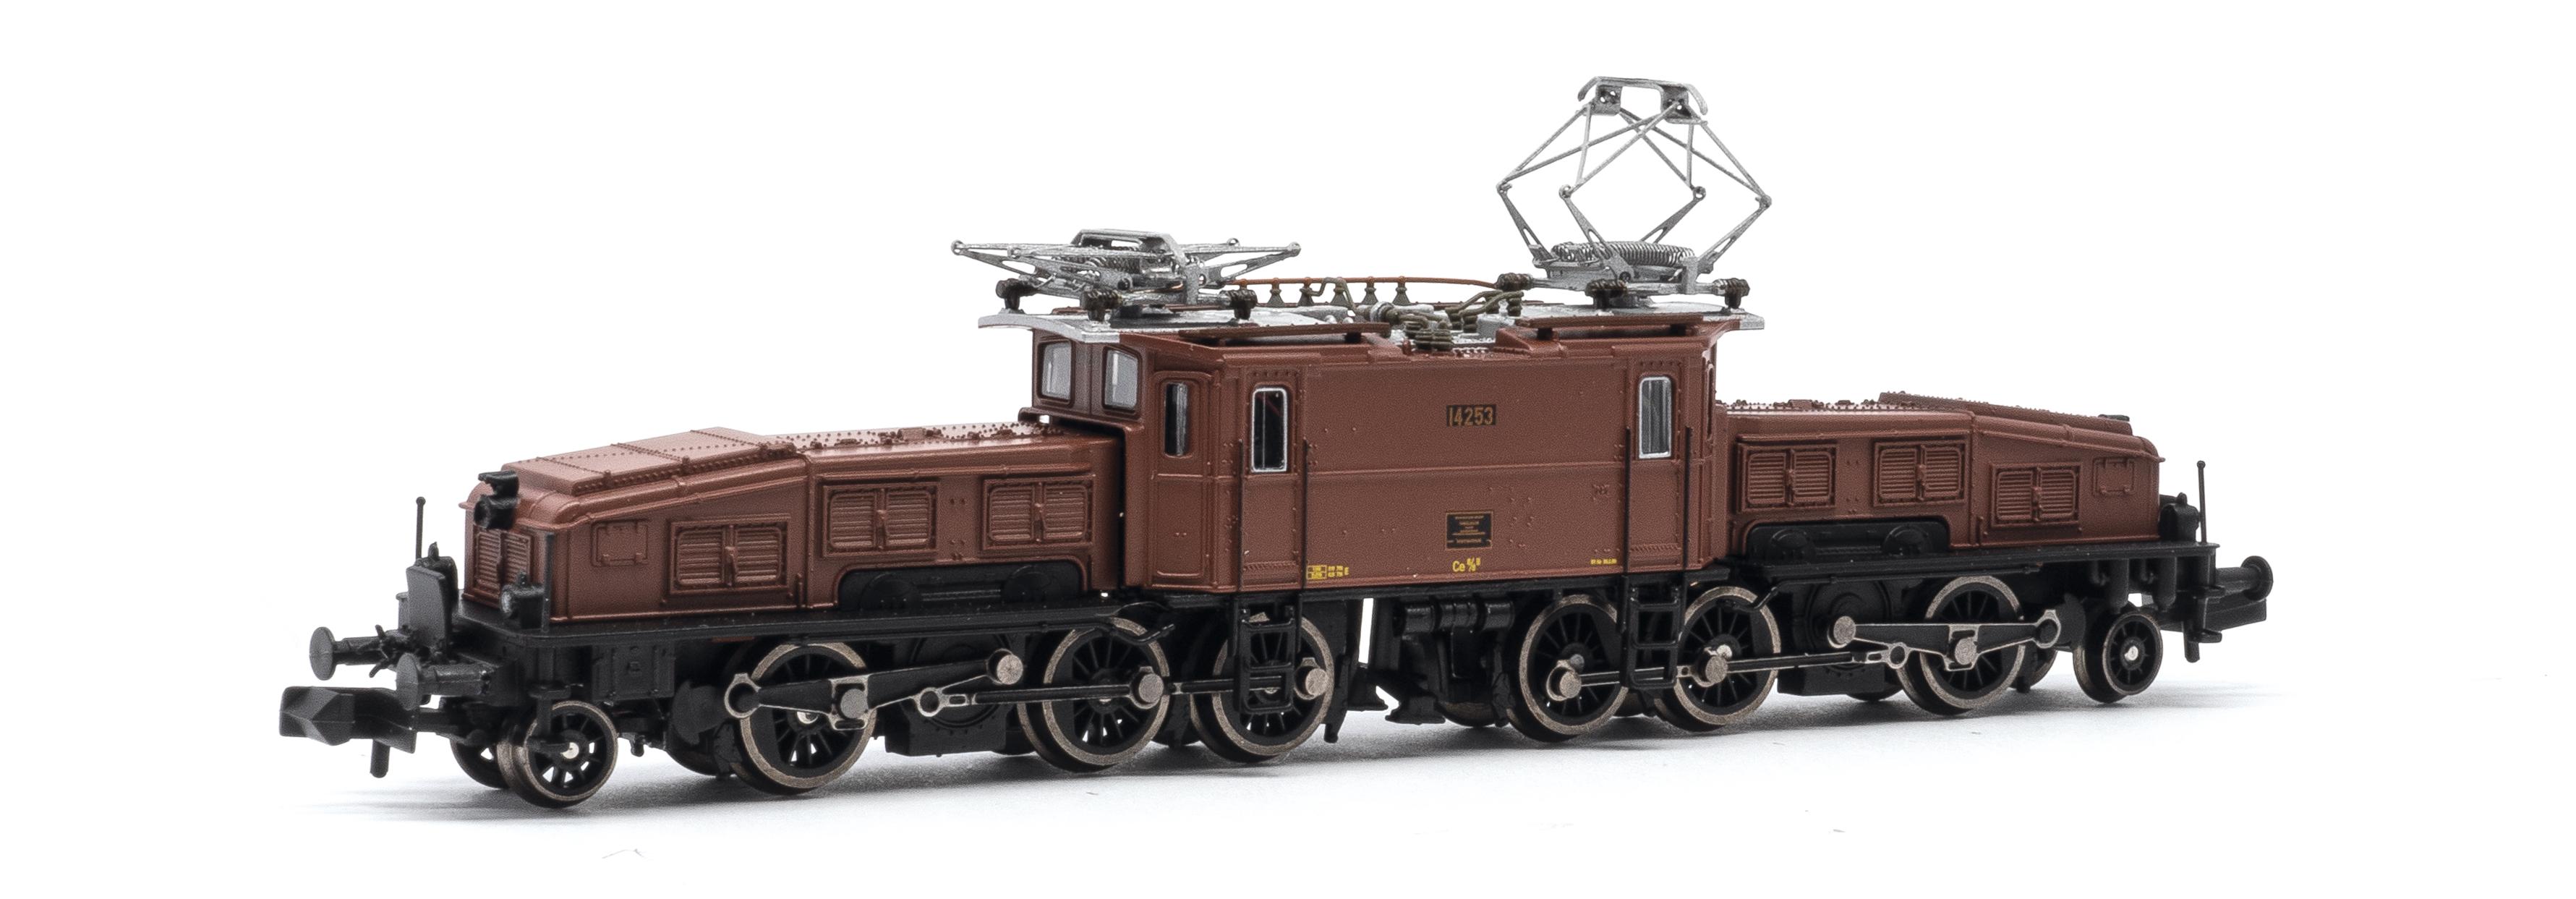 JC62132